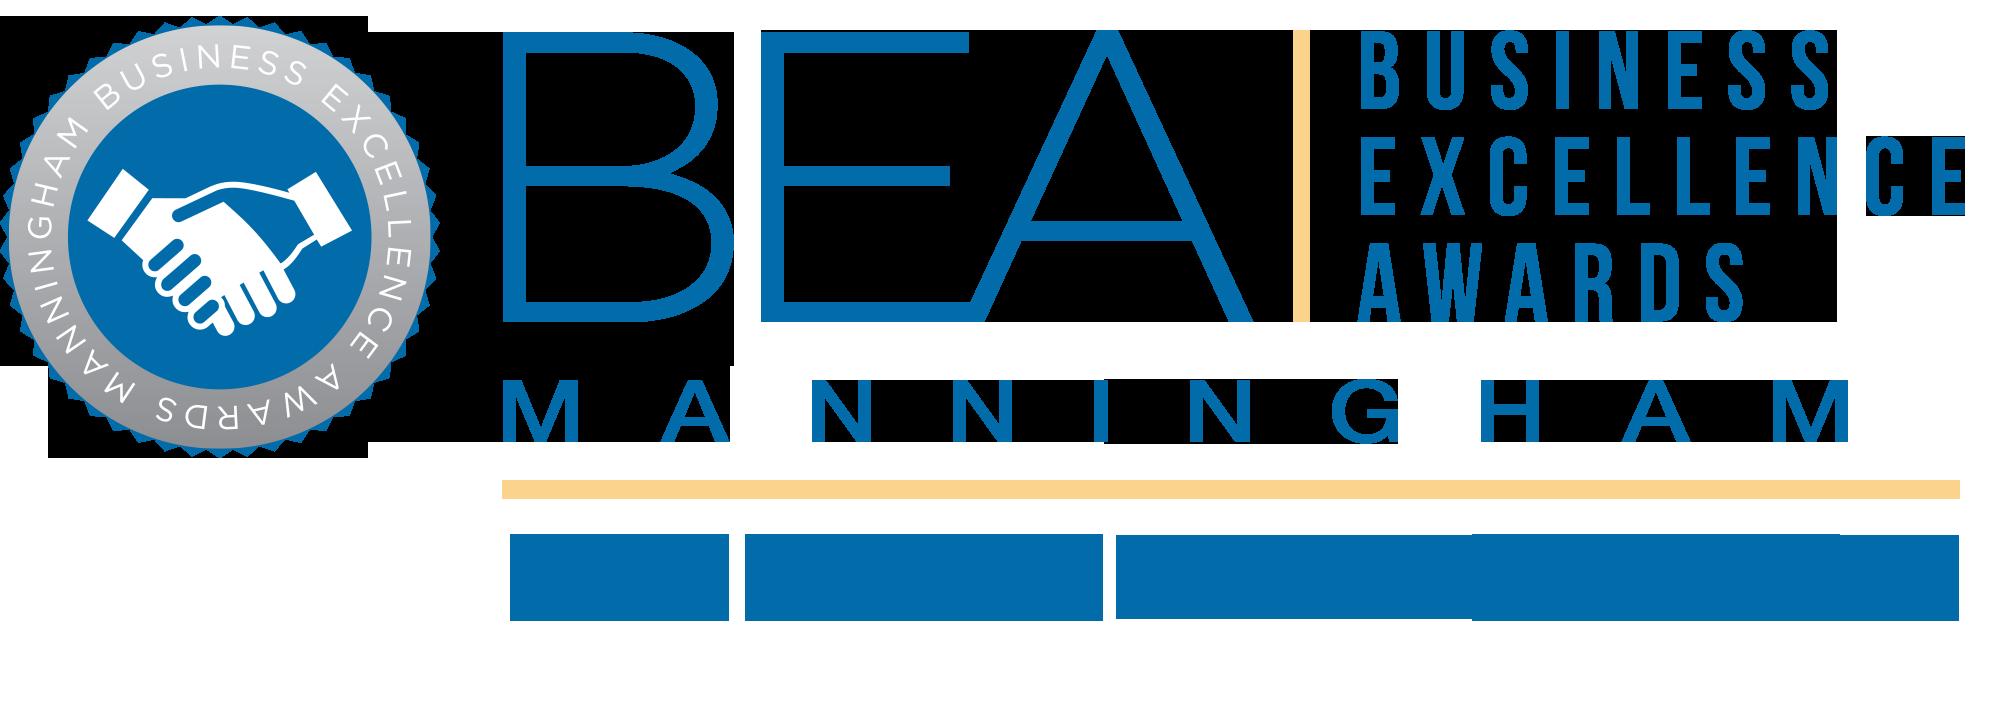 BEA_ManninghamBEA2015